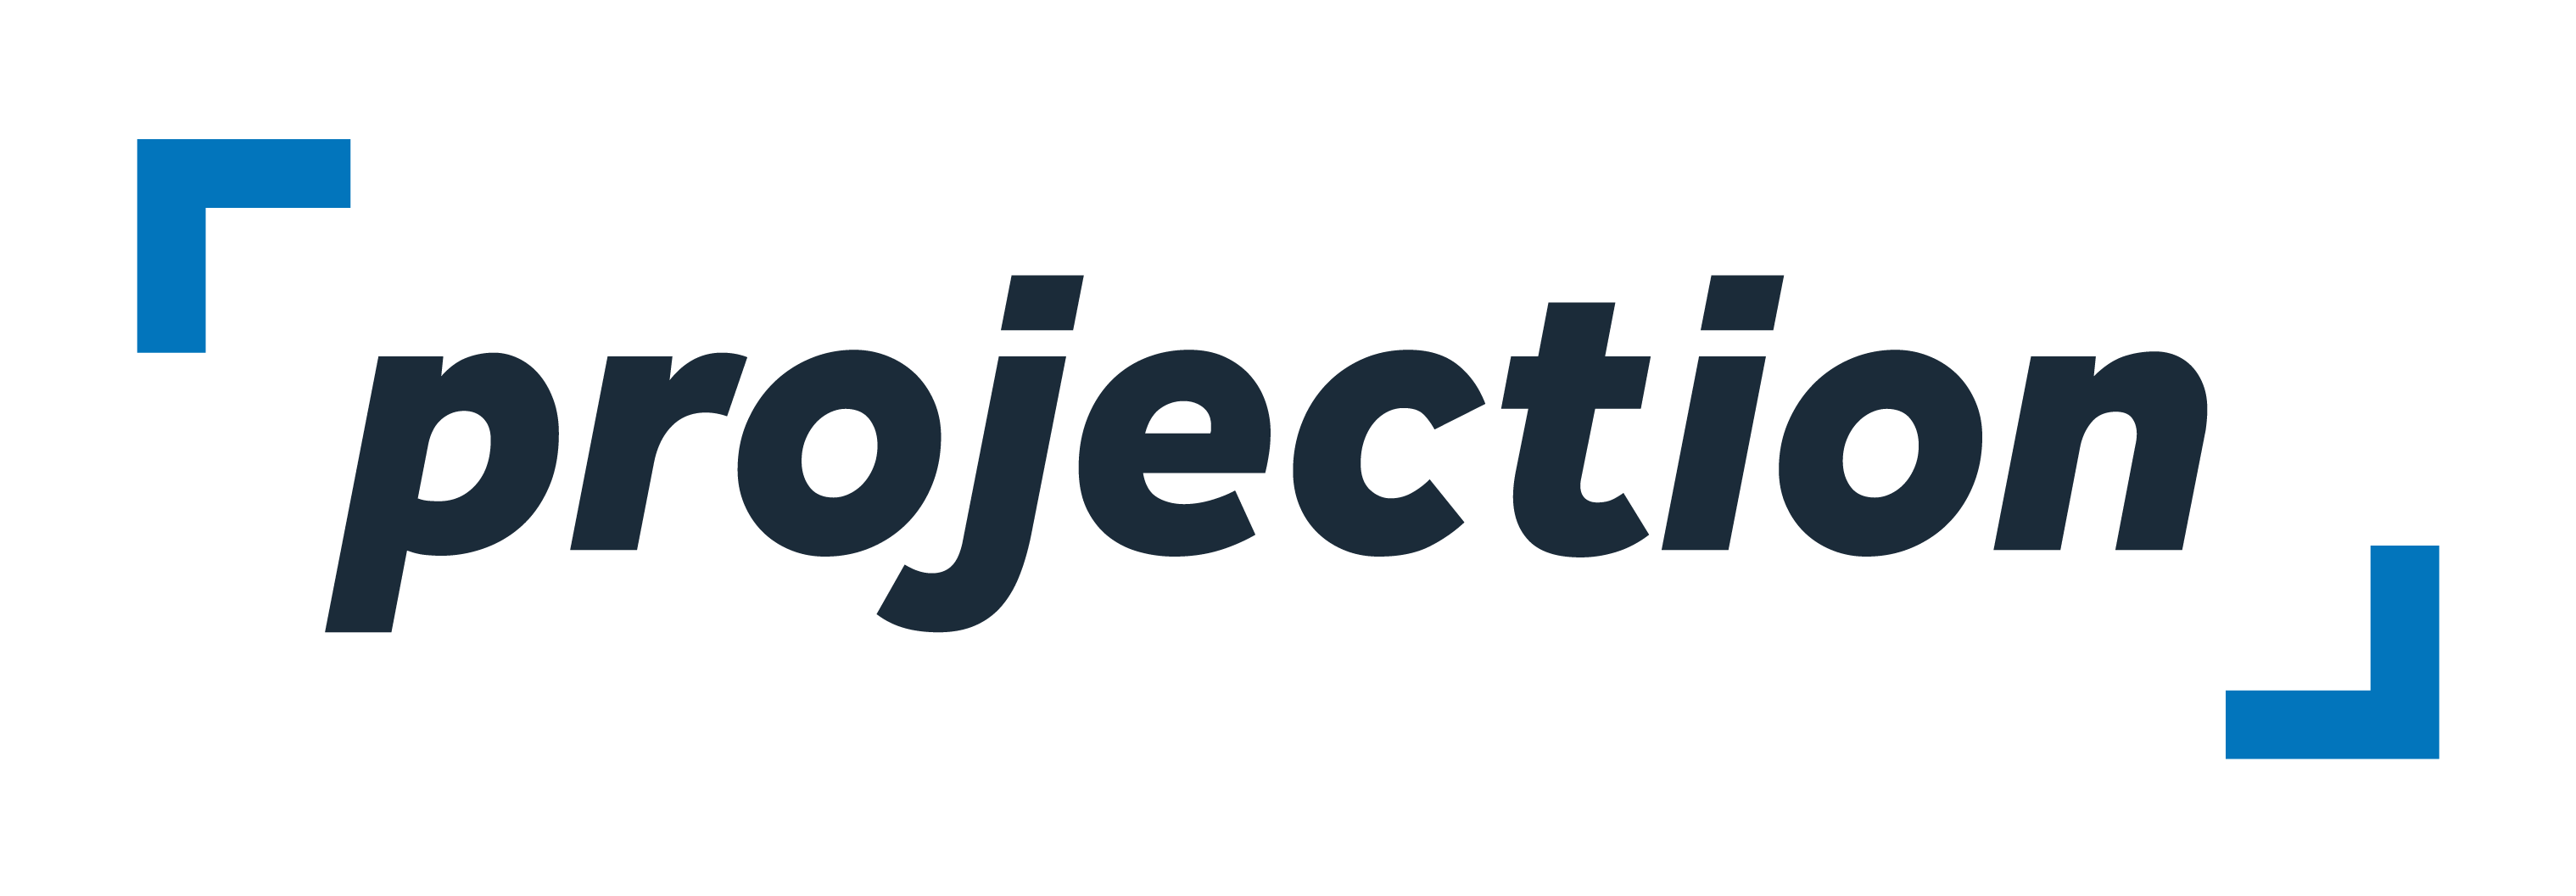 Projection_logo__Lapis_dark_CMYK